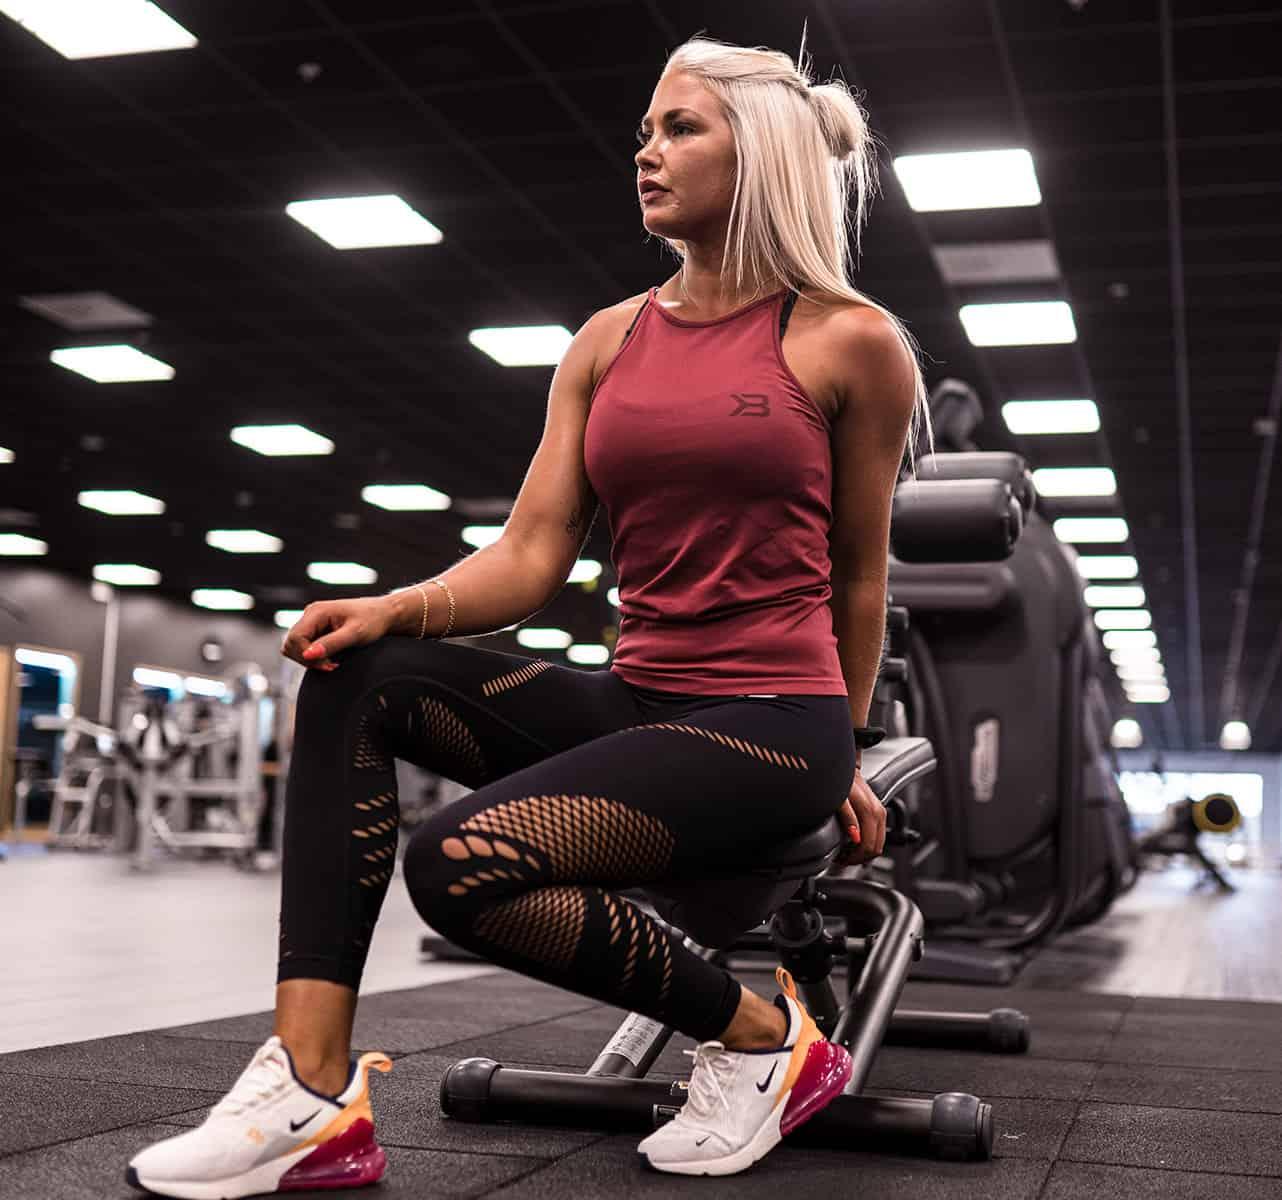 Koszulka na fitness i crossfit